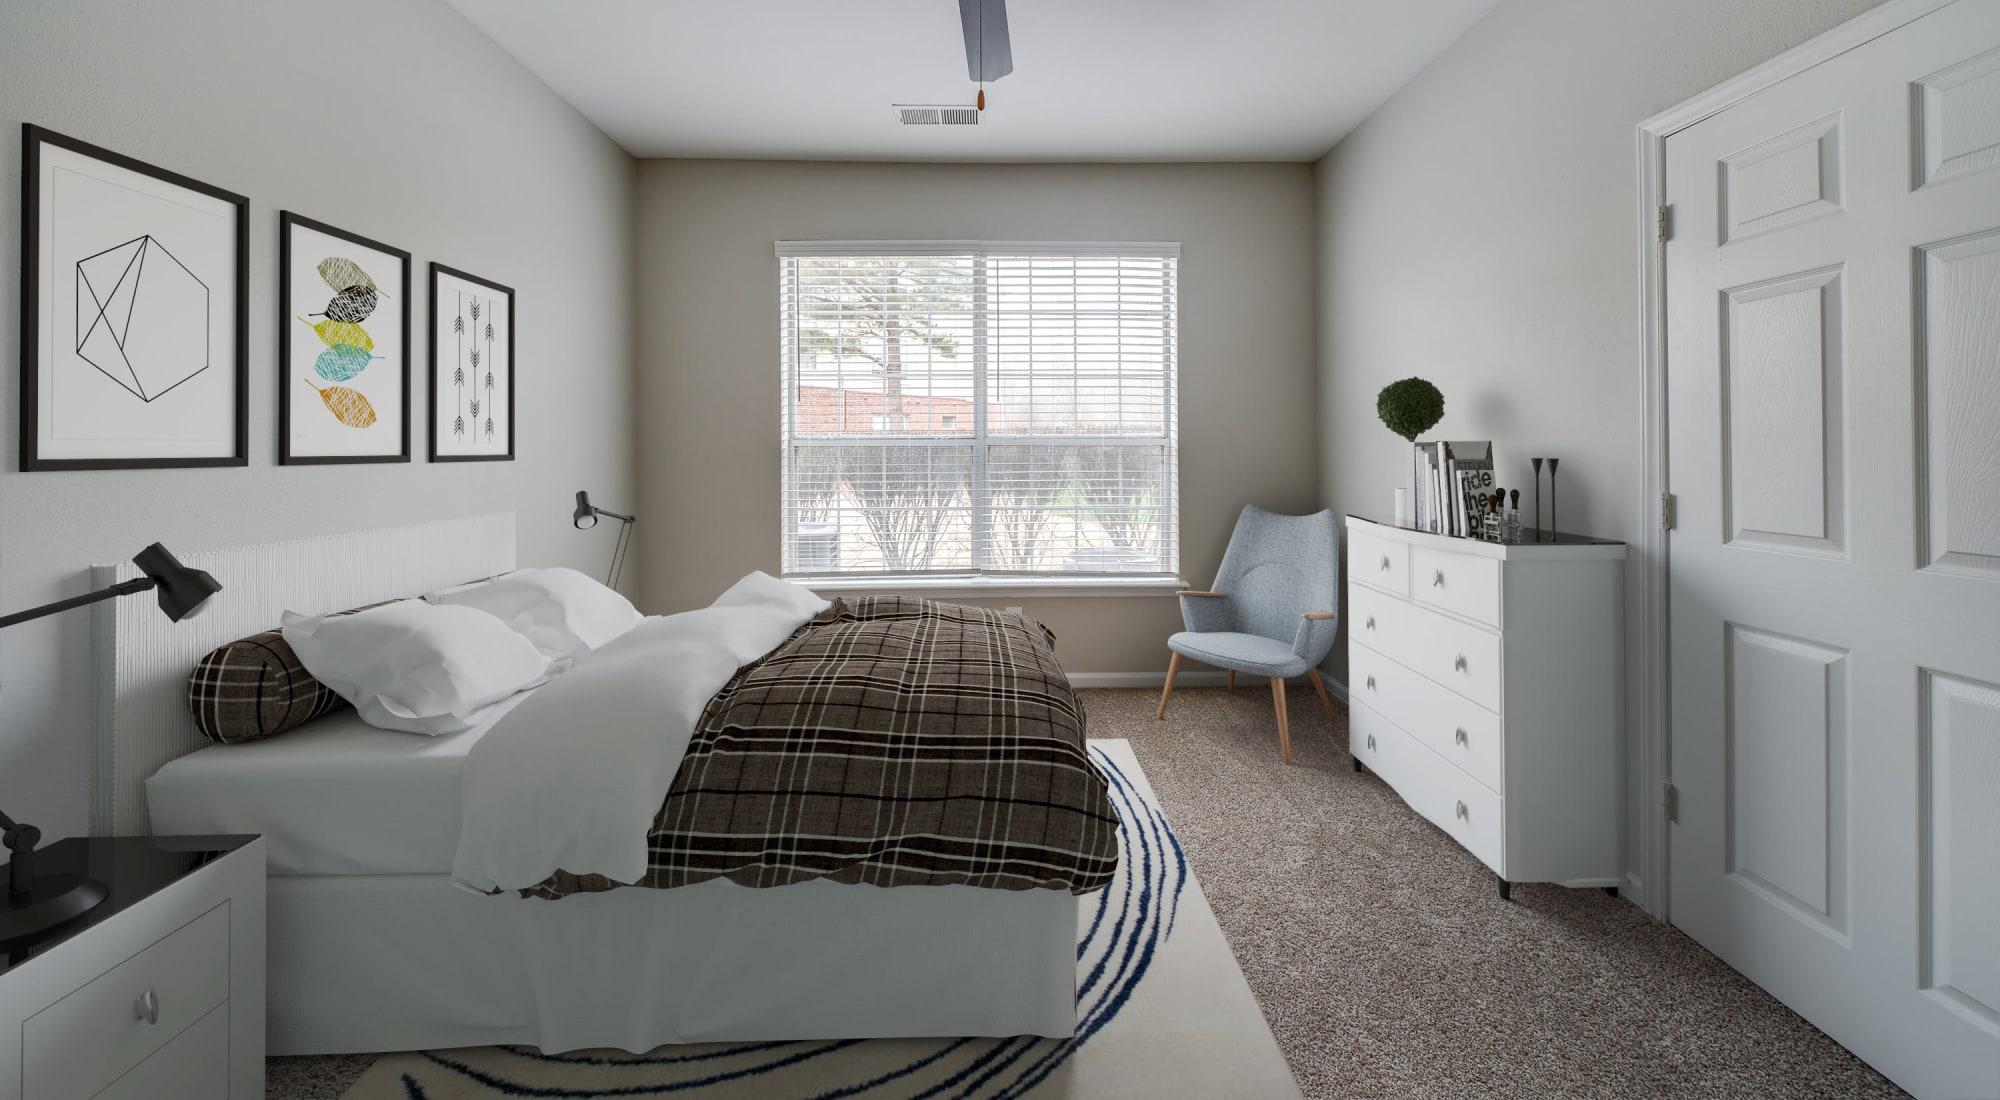 Apartments at Preston View in Morrisville, North Carolina